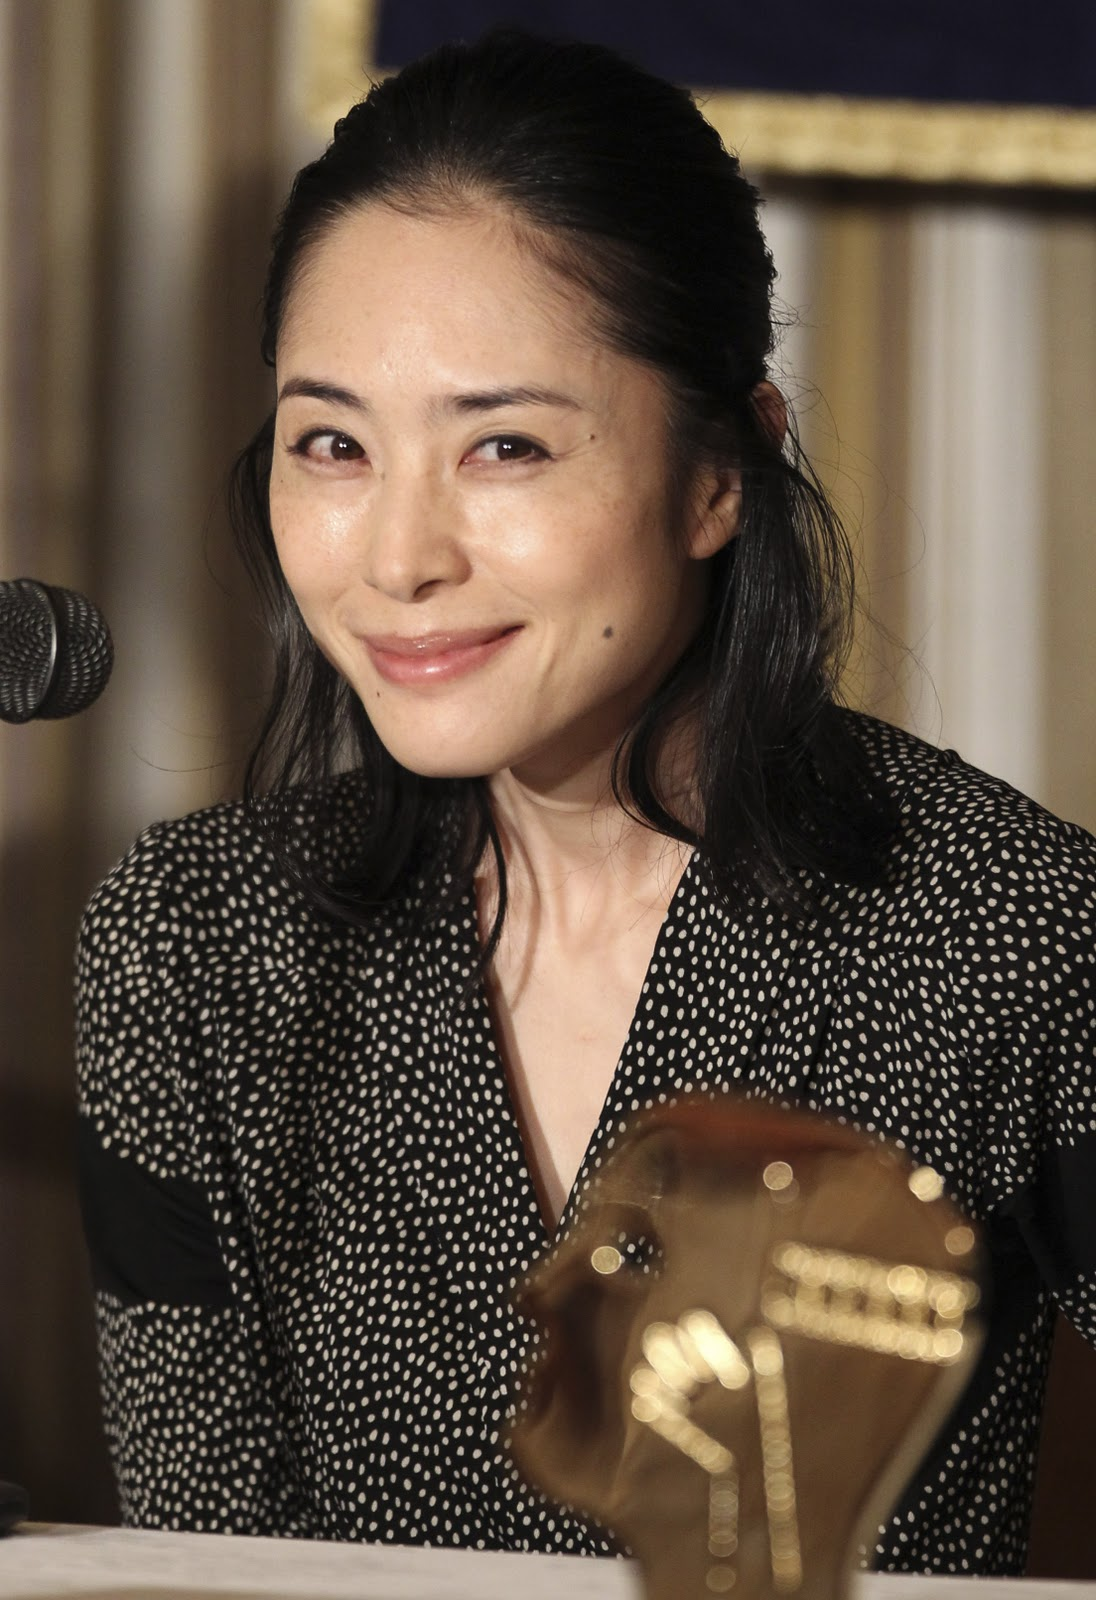 Eri Fukatsu earned a  million dollar salary, leaving the net worth at 5 million in 2017